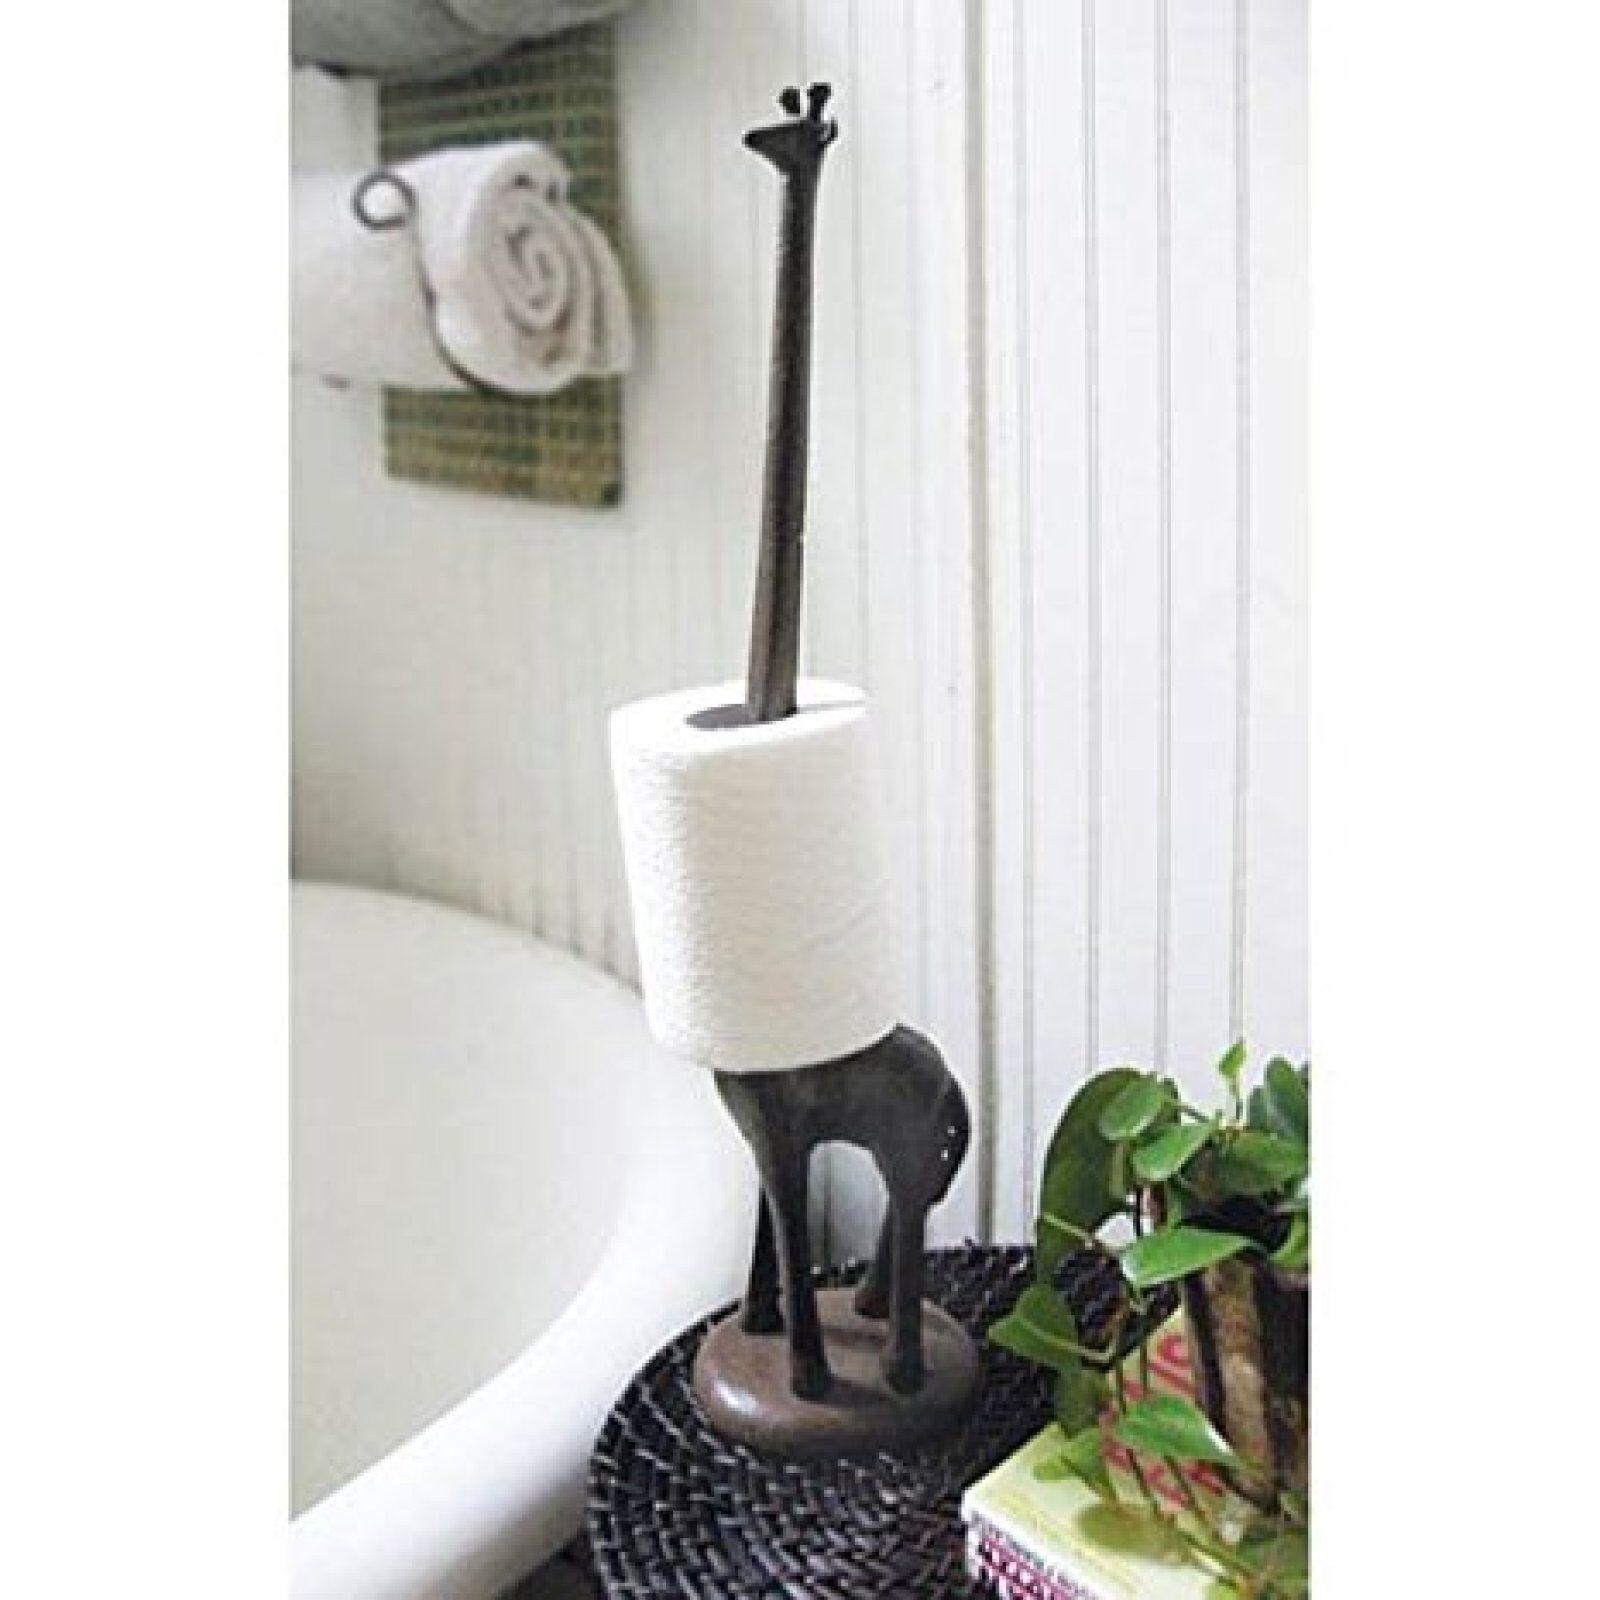 Bathroom Toilet Repair Decoration decorative toilet paper | ebay